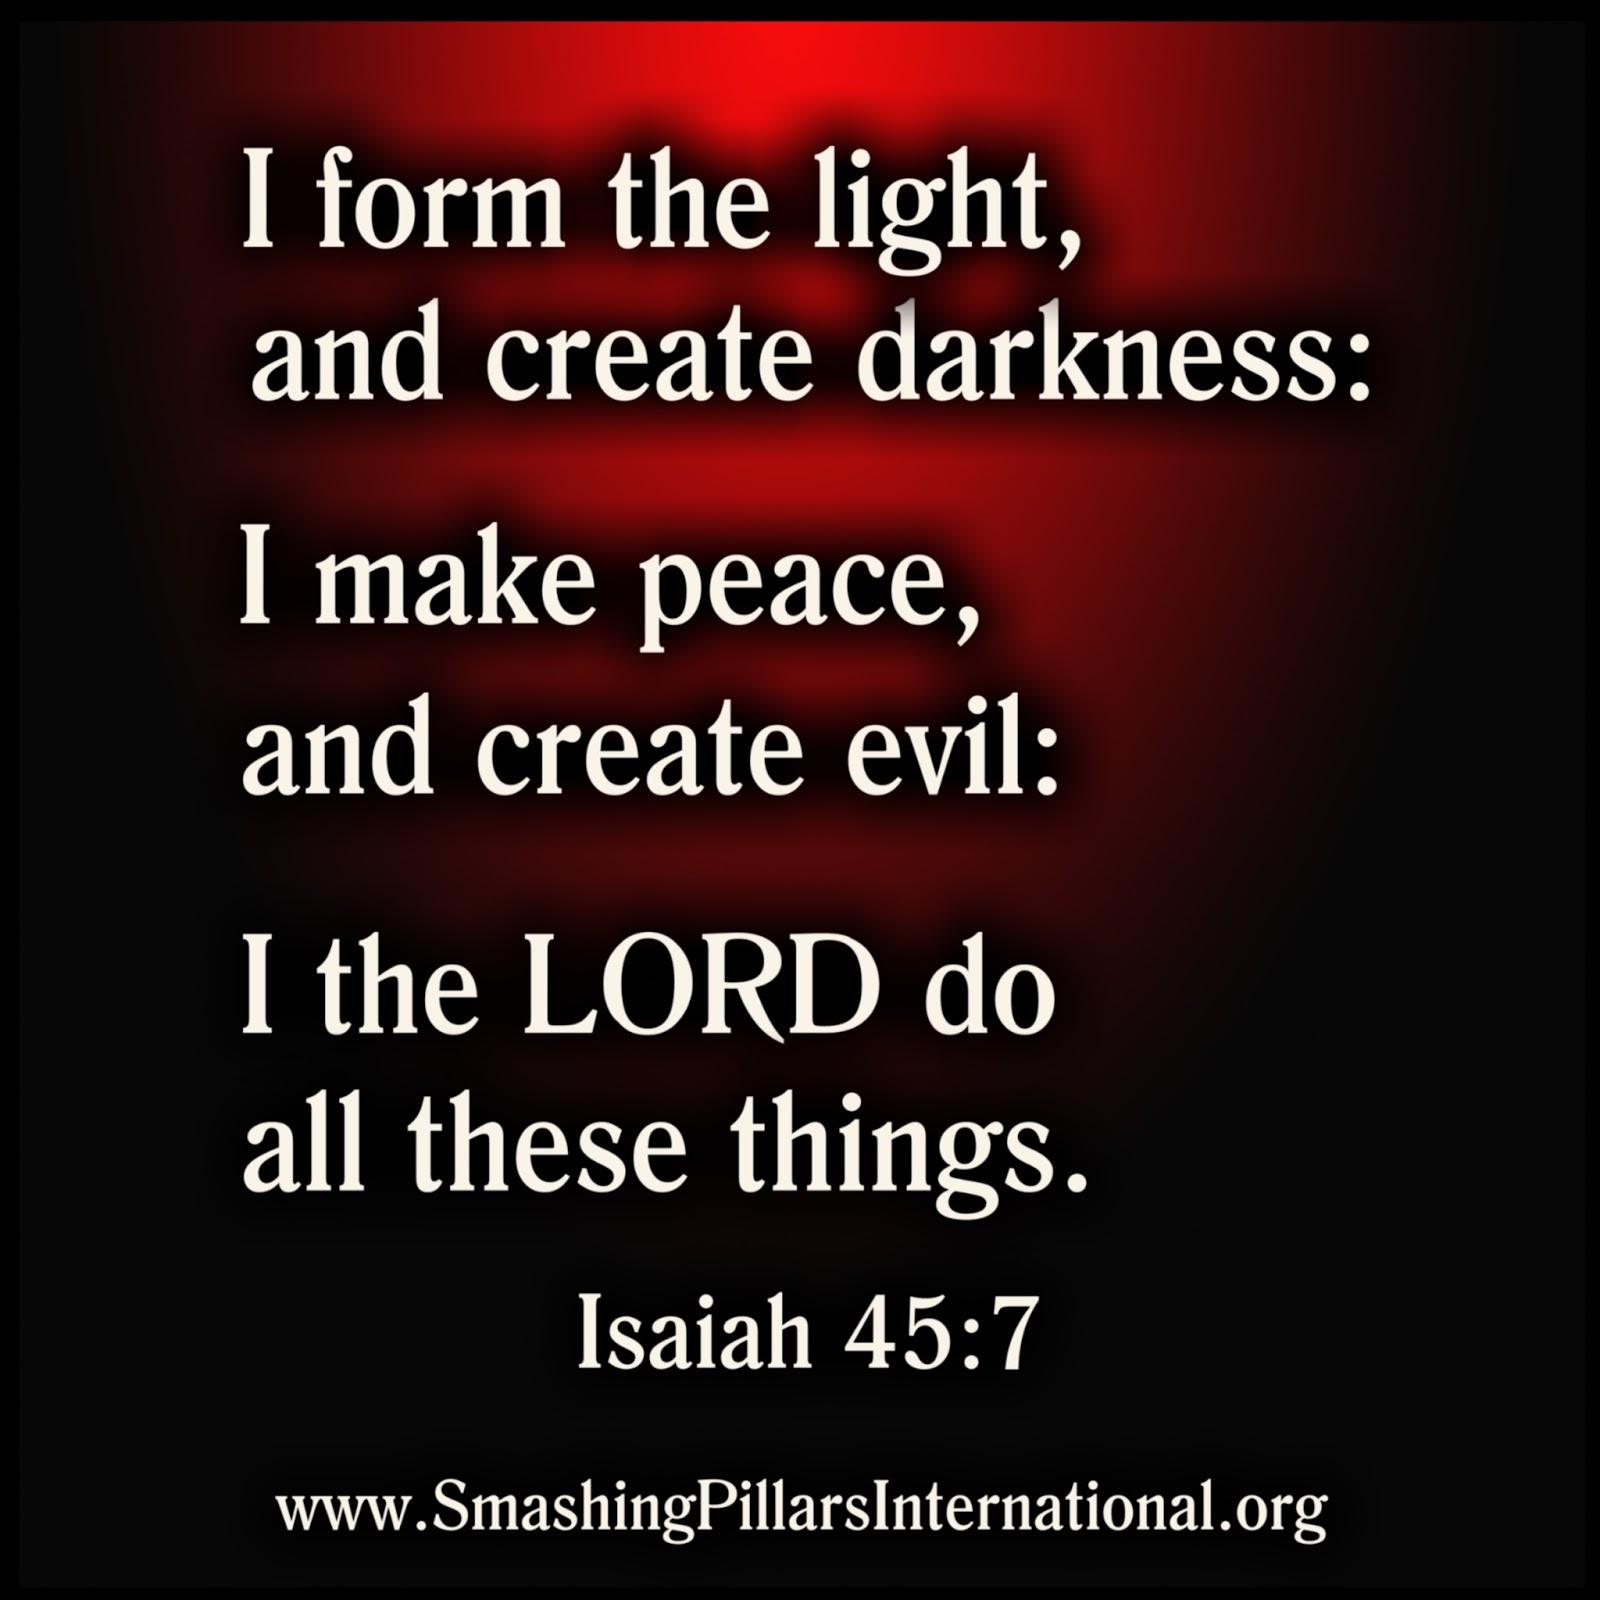 Smashing Pillars International : Does God create evil?